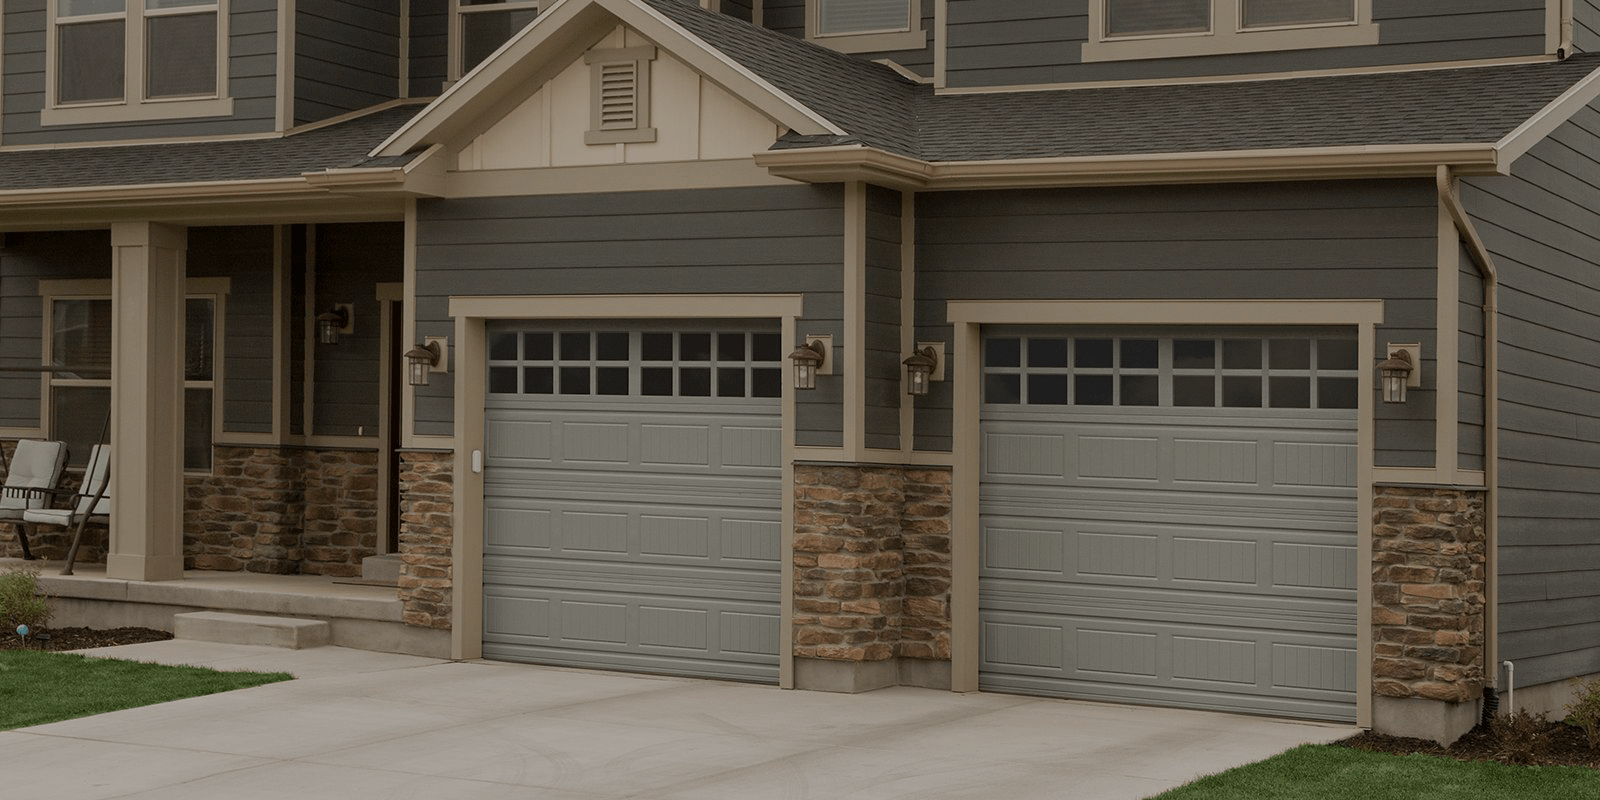 Southwest Doors Garage Door Sales Repair Residential